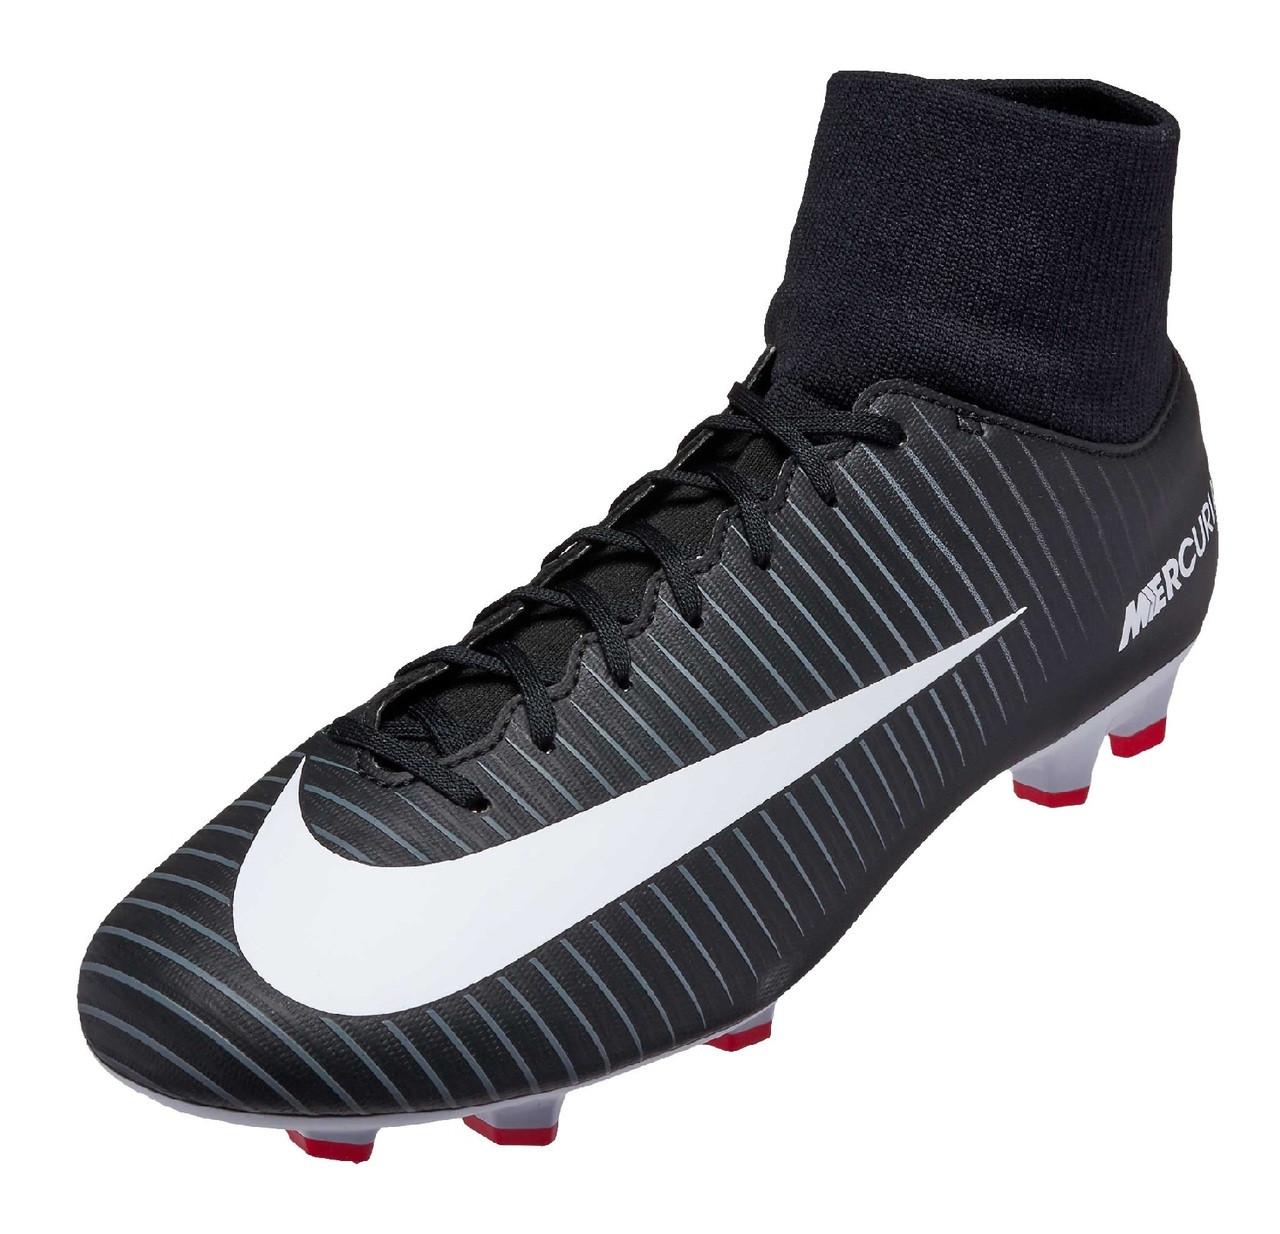 Nike Mercurial Victory VI DF FG - Black White Dark Grey (32618 ... 34305f387